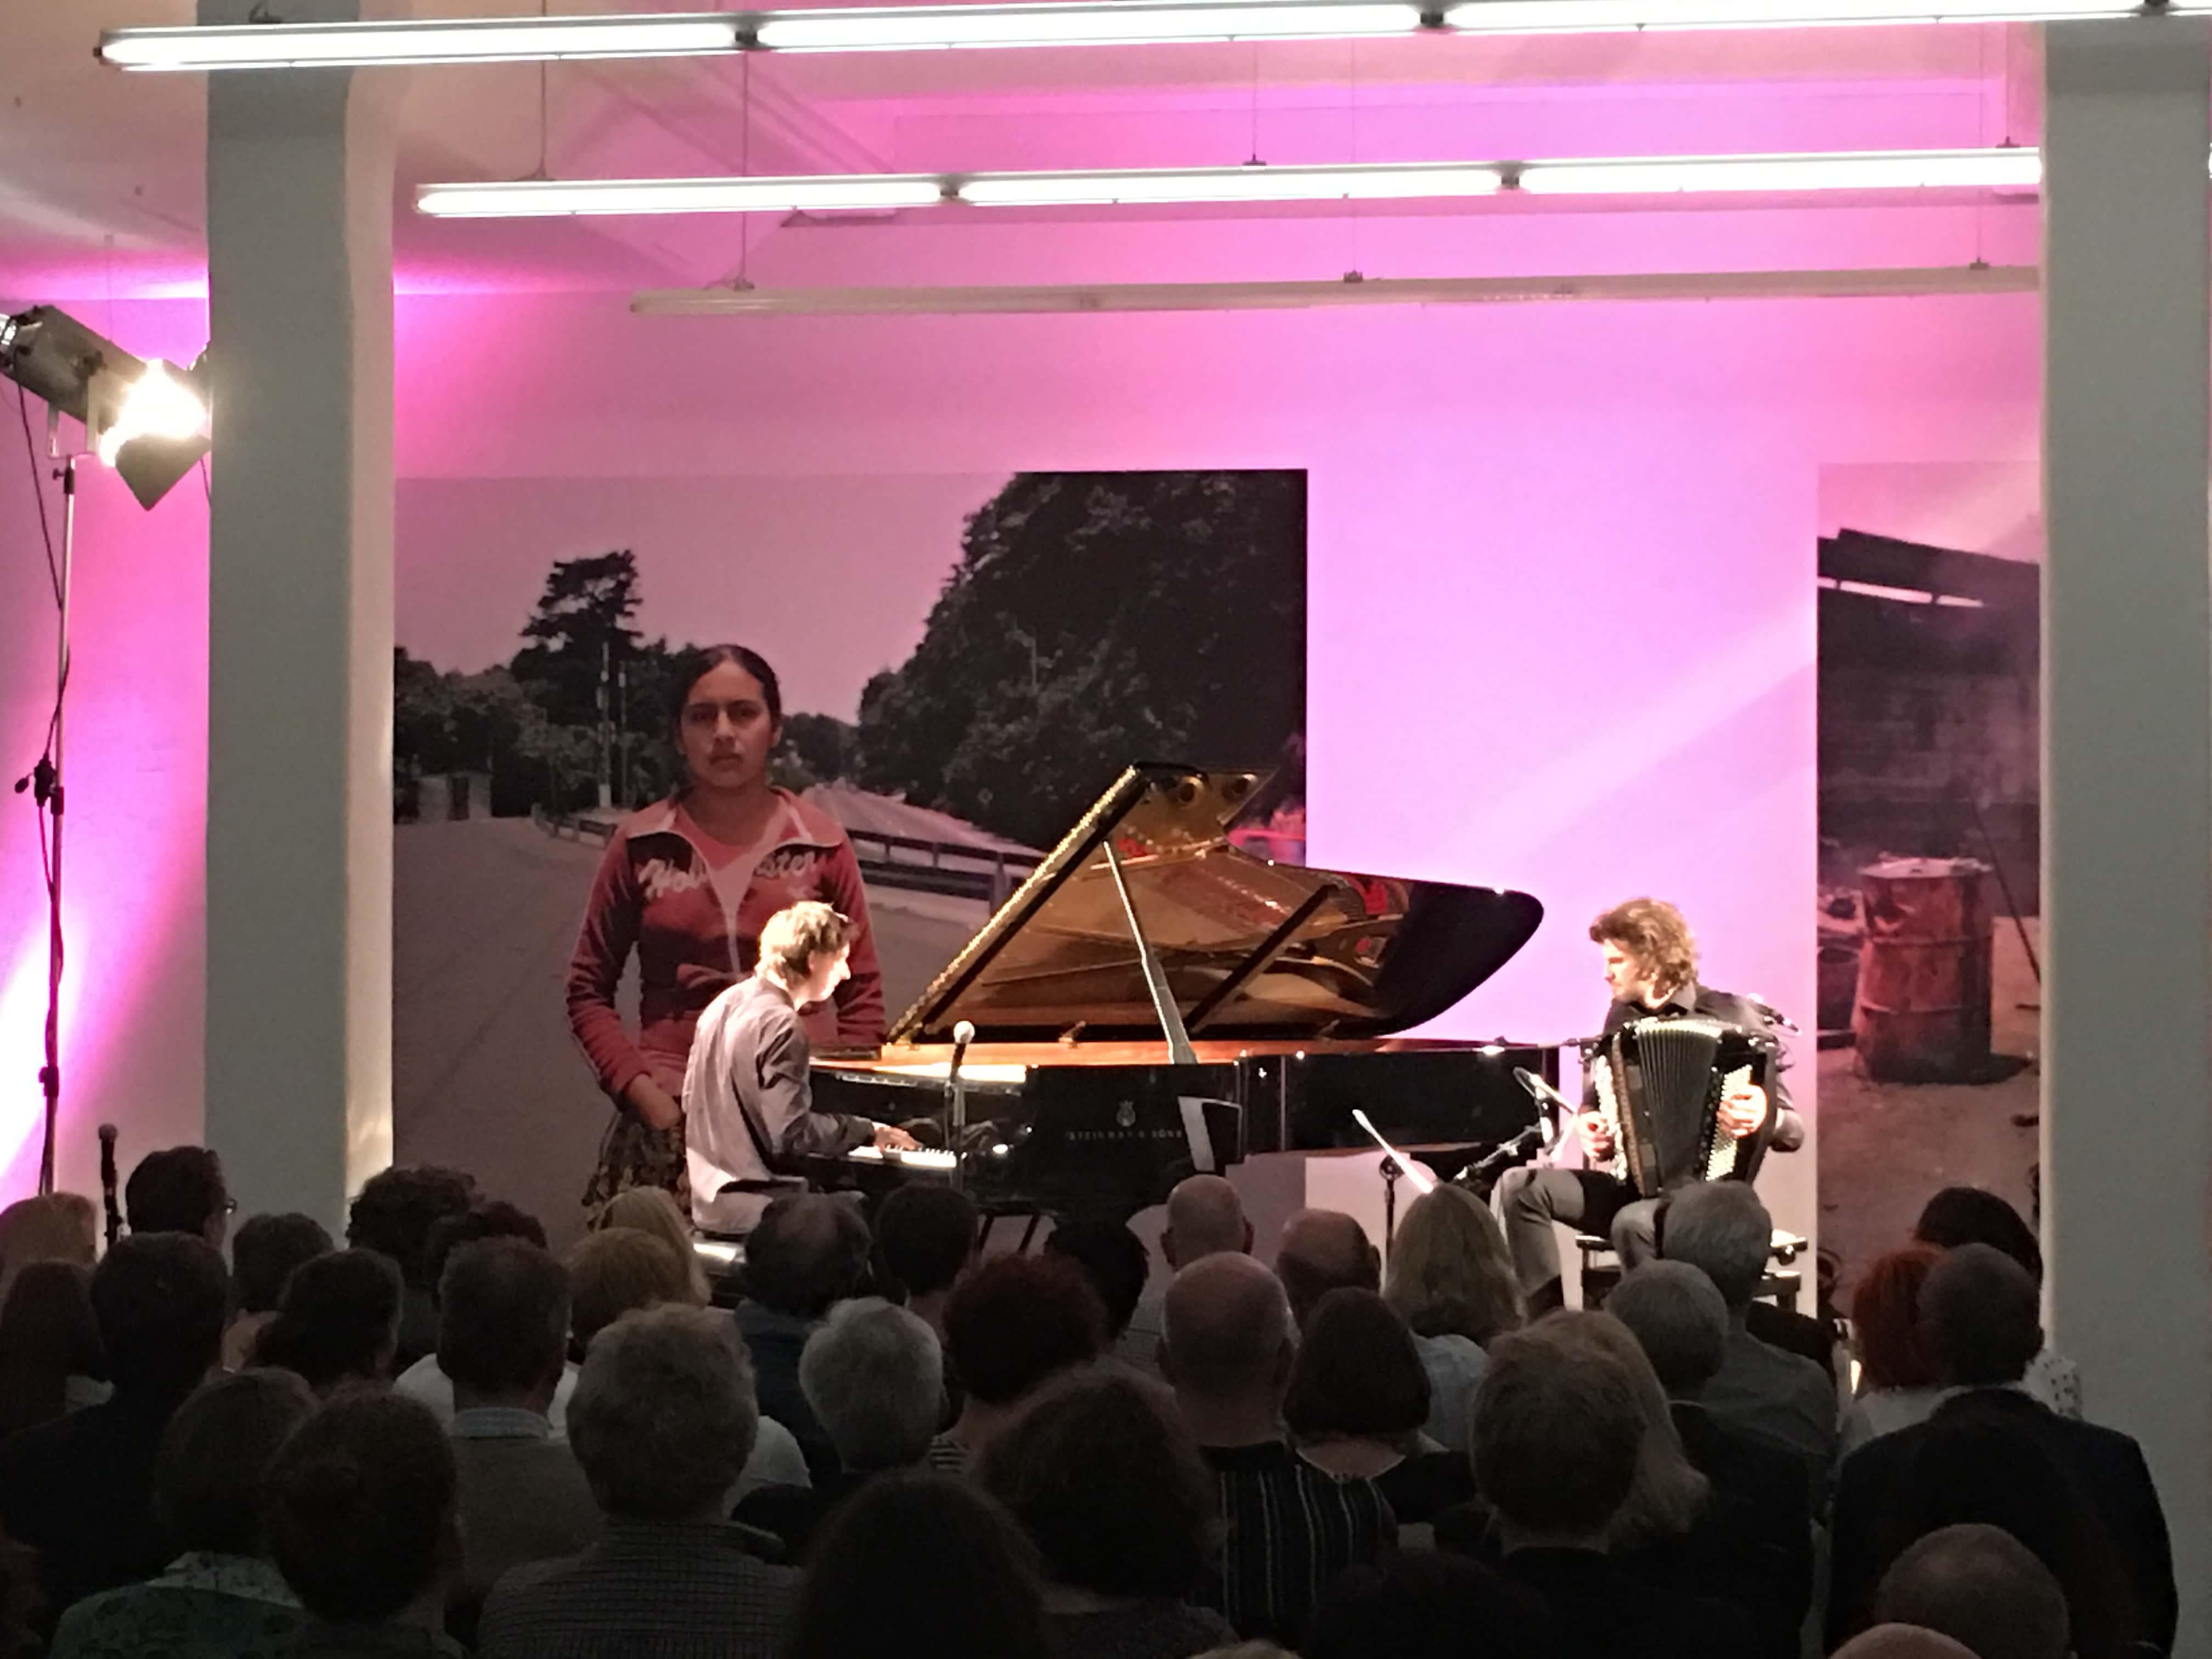 Mozartfest 2017: Jazz-Duo Michael Wollny & Vincent Peirani. Foto (c) DAZ